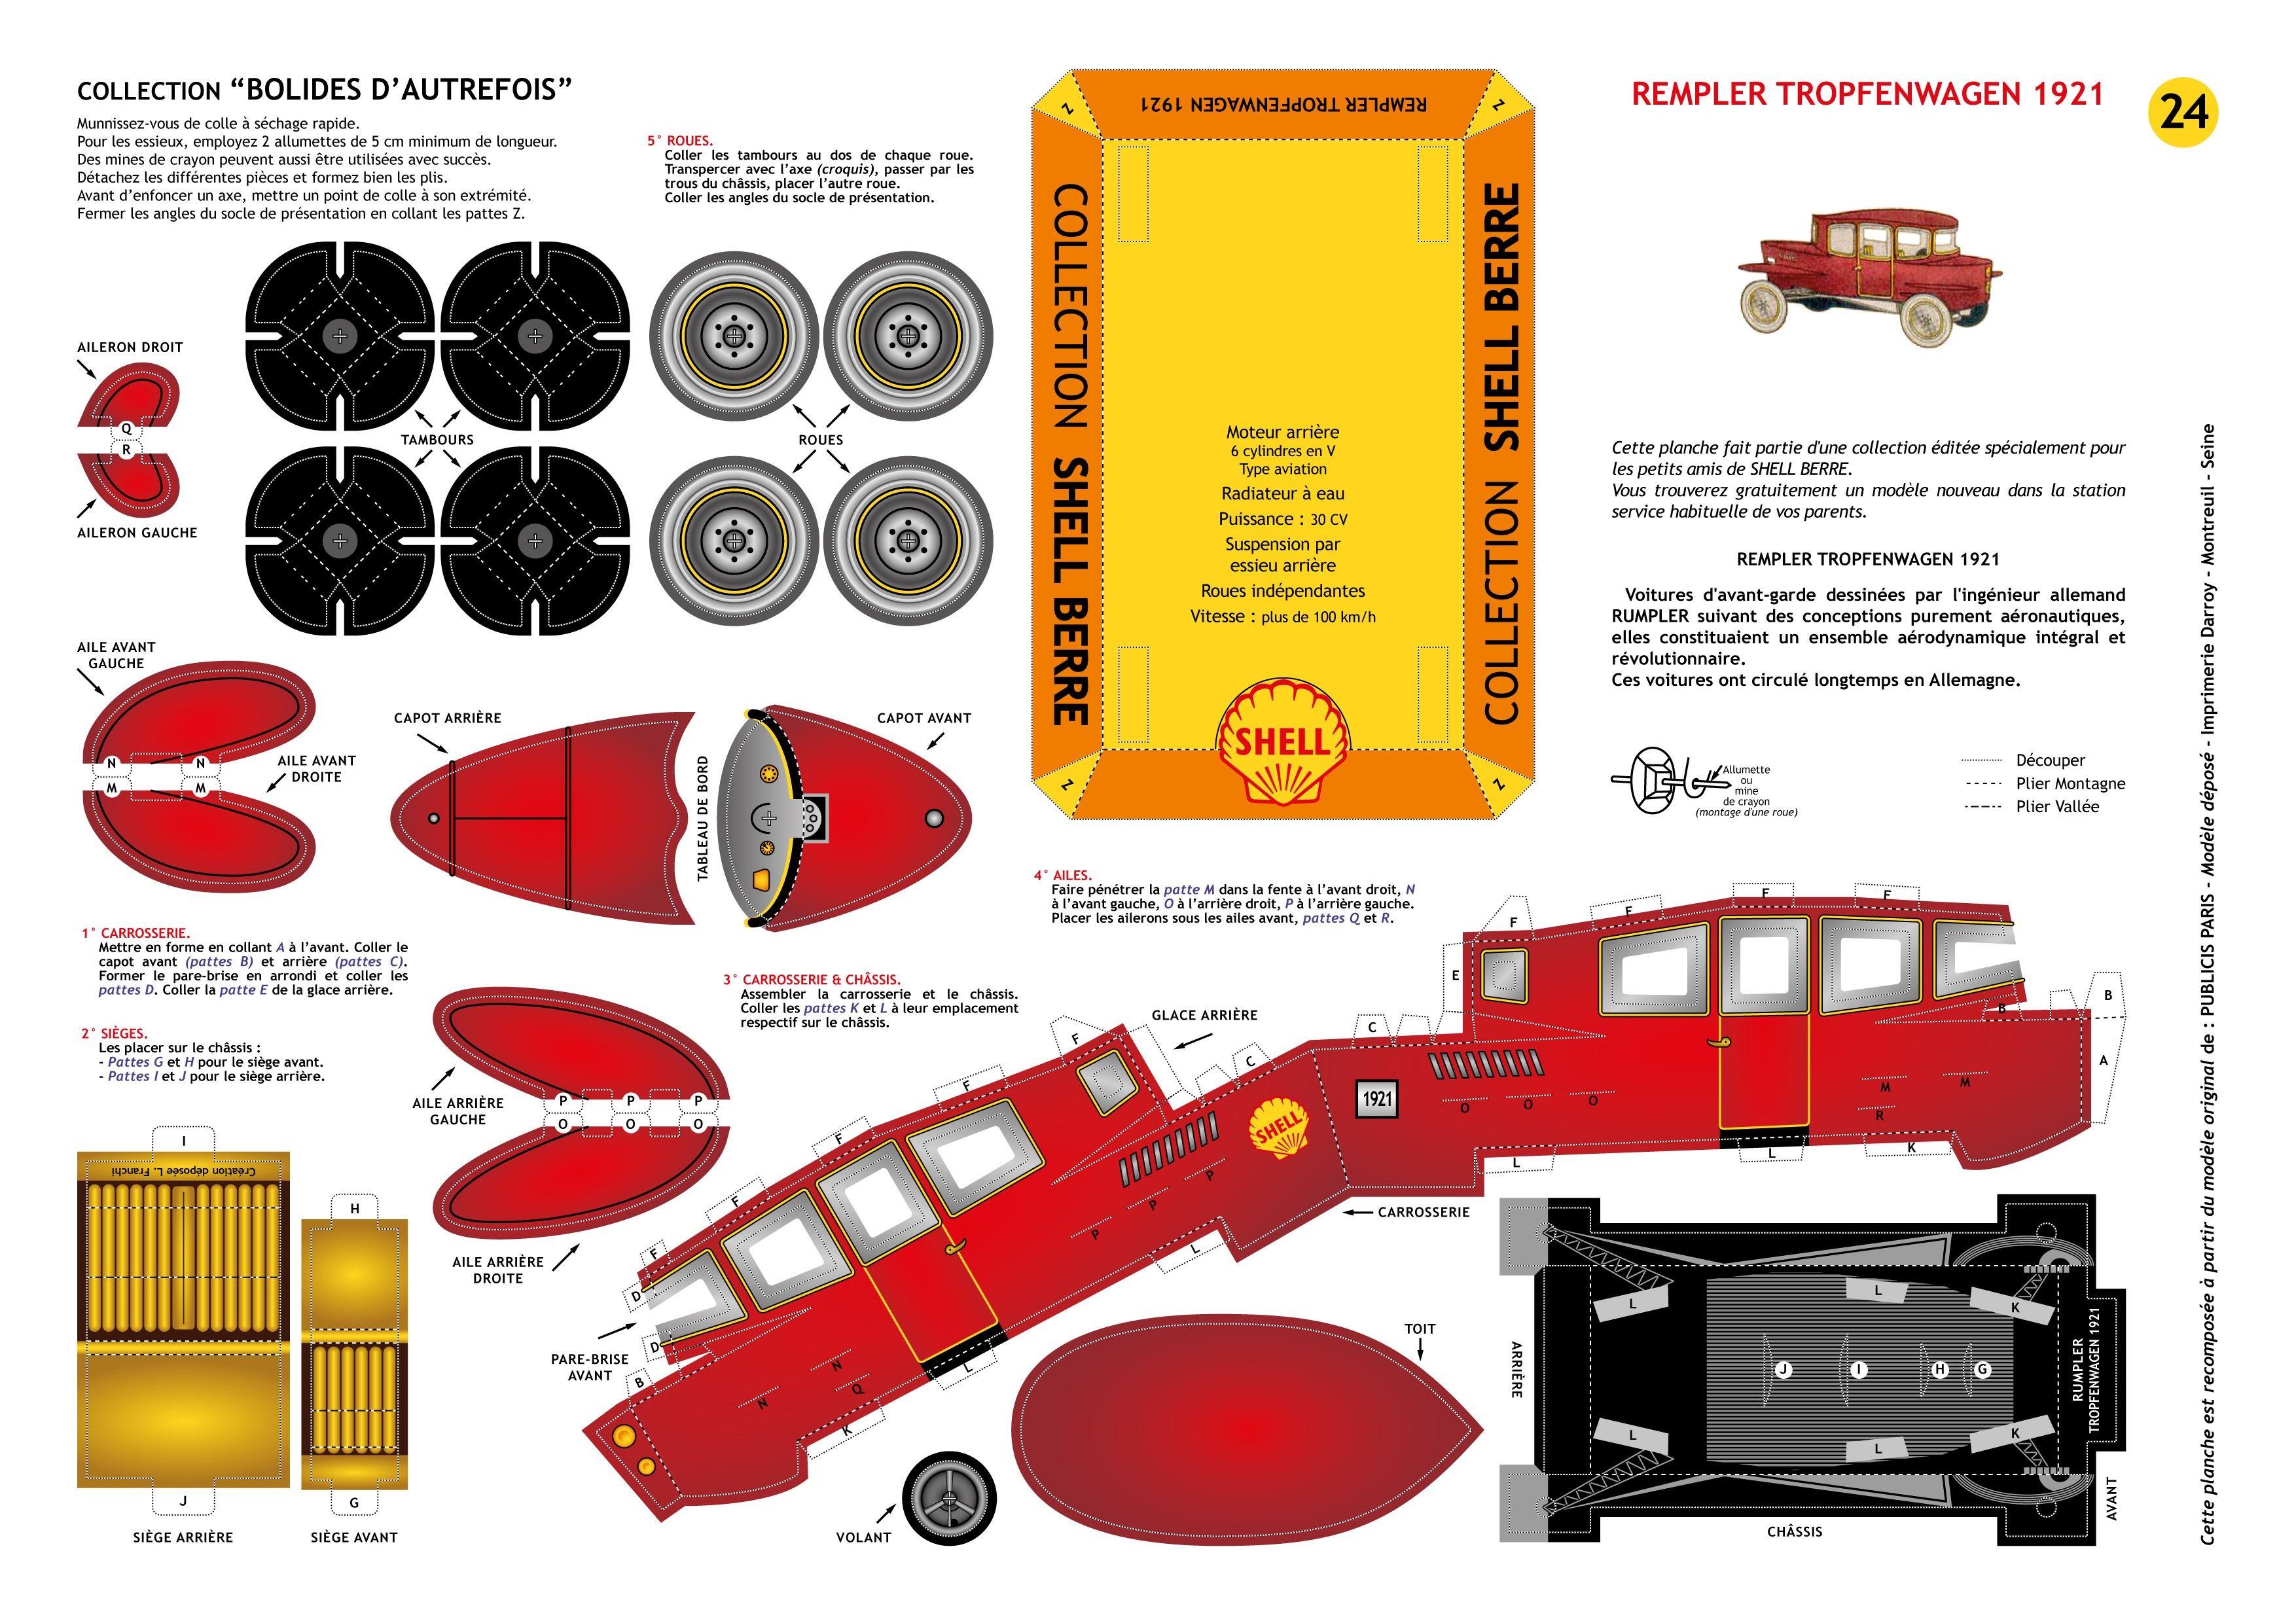 Papercraft Blogspot Maquette Shell Berre N°24 Rumpler Tropfenwagen 1921 Re Posée